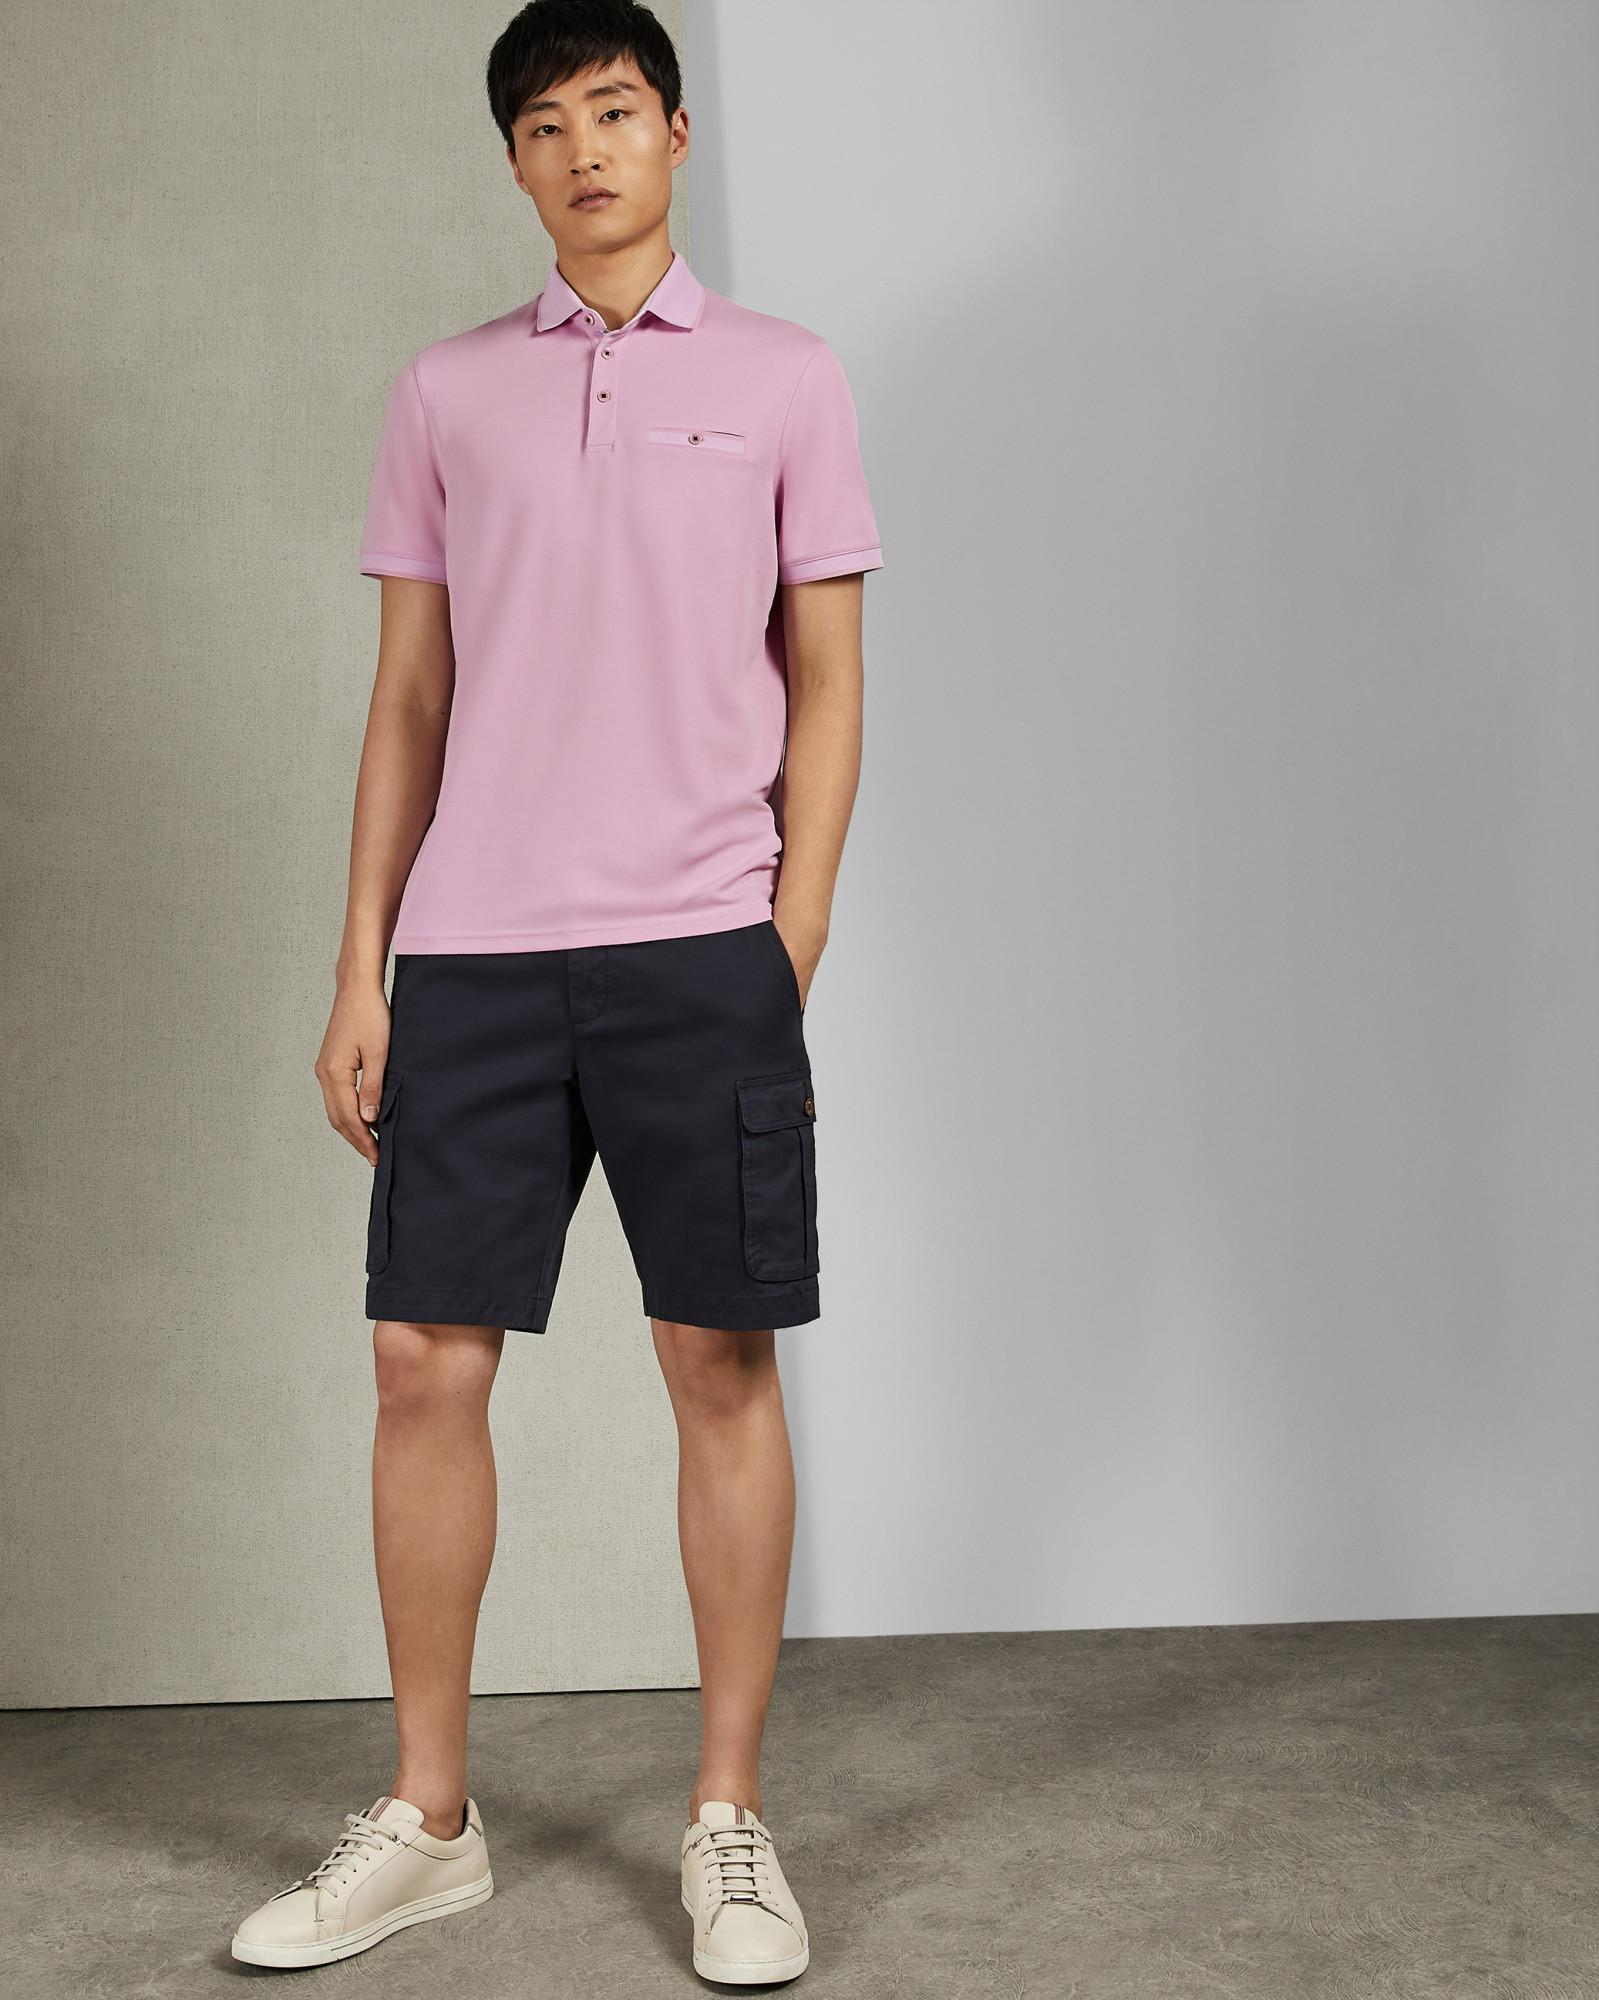 ecaffd20af0b Lyst - Ted Baker Flat Knit Polo Shirt in Pink for Men